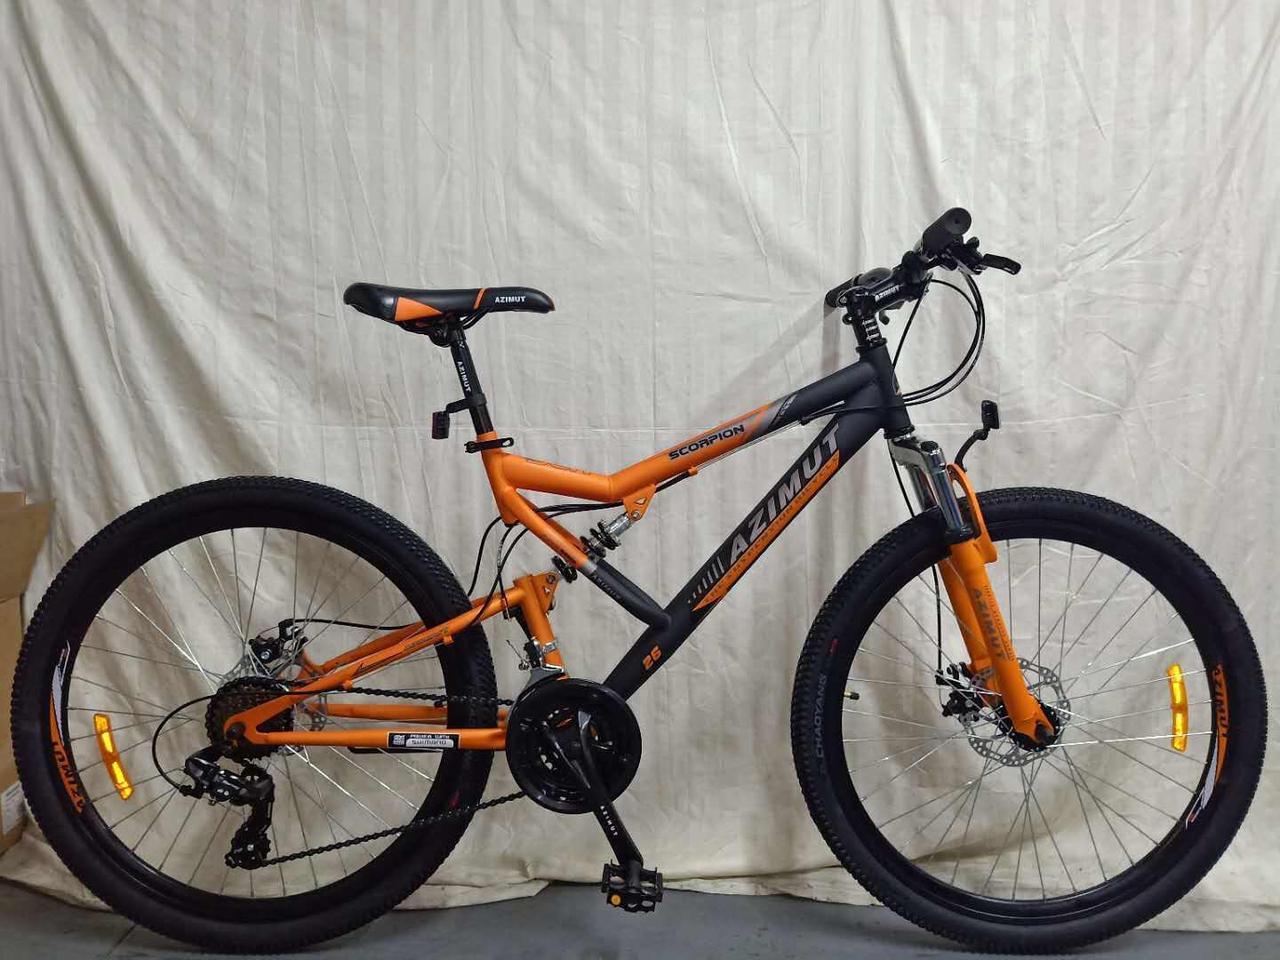 "Azimut Велосипед Azimut Scorpion 24"" 17"" Black / Orange (FR/D/Scorpion)"